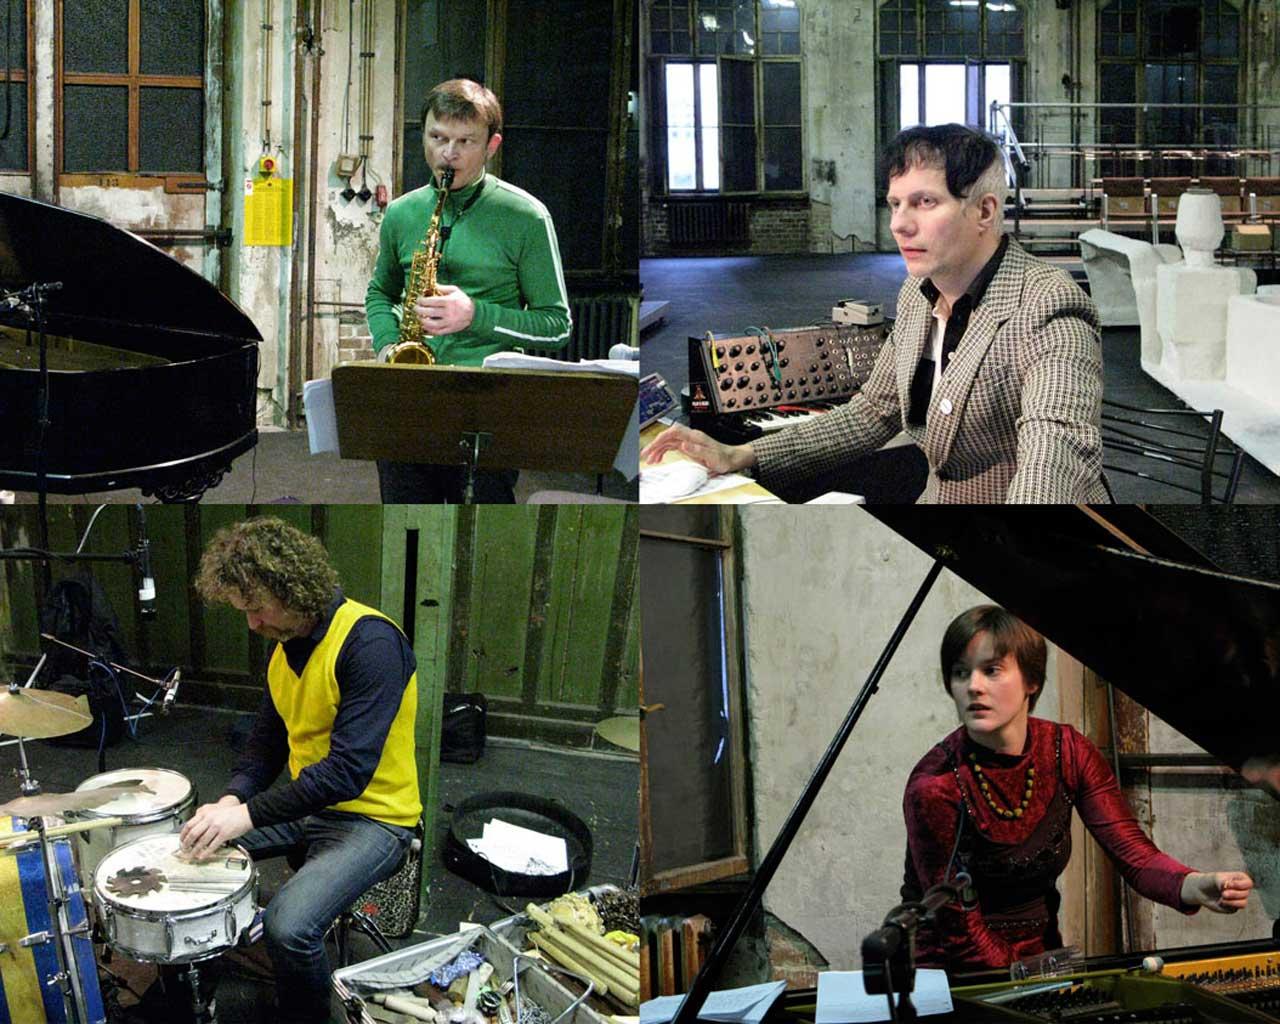 Ensemble Intégrales & Felix Kubin (Photo: Mirjam Staub), Echohaus